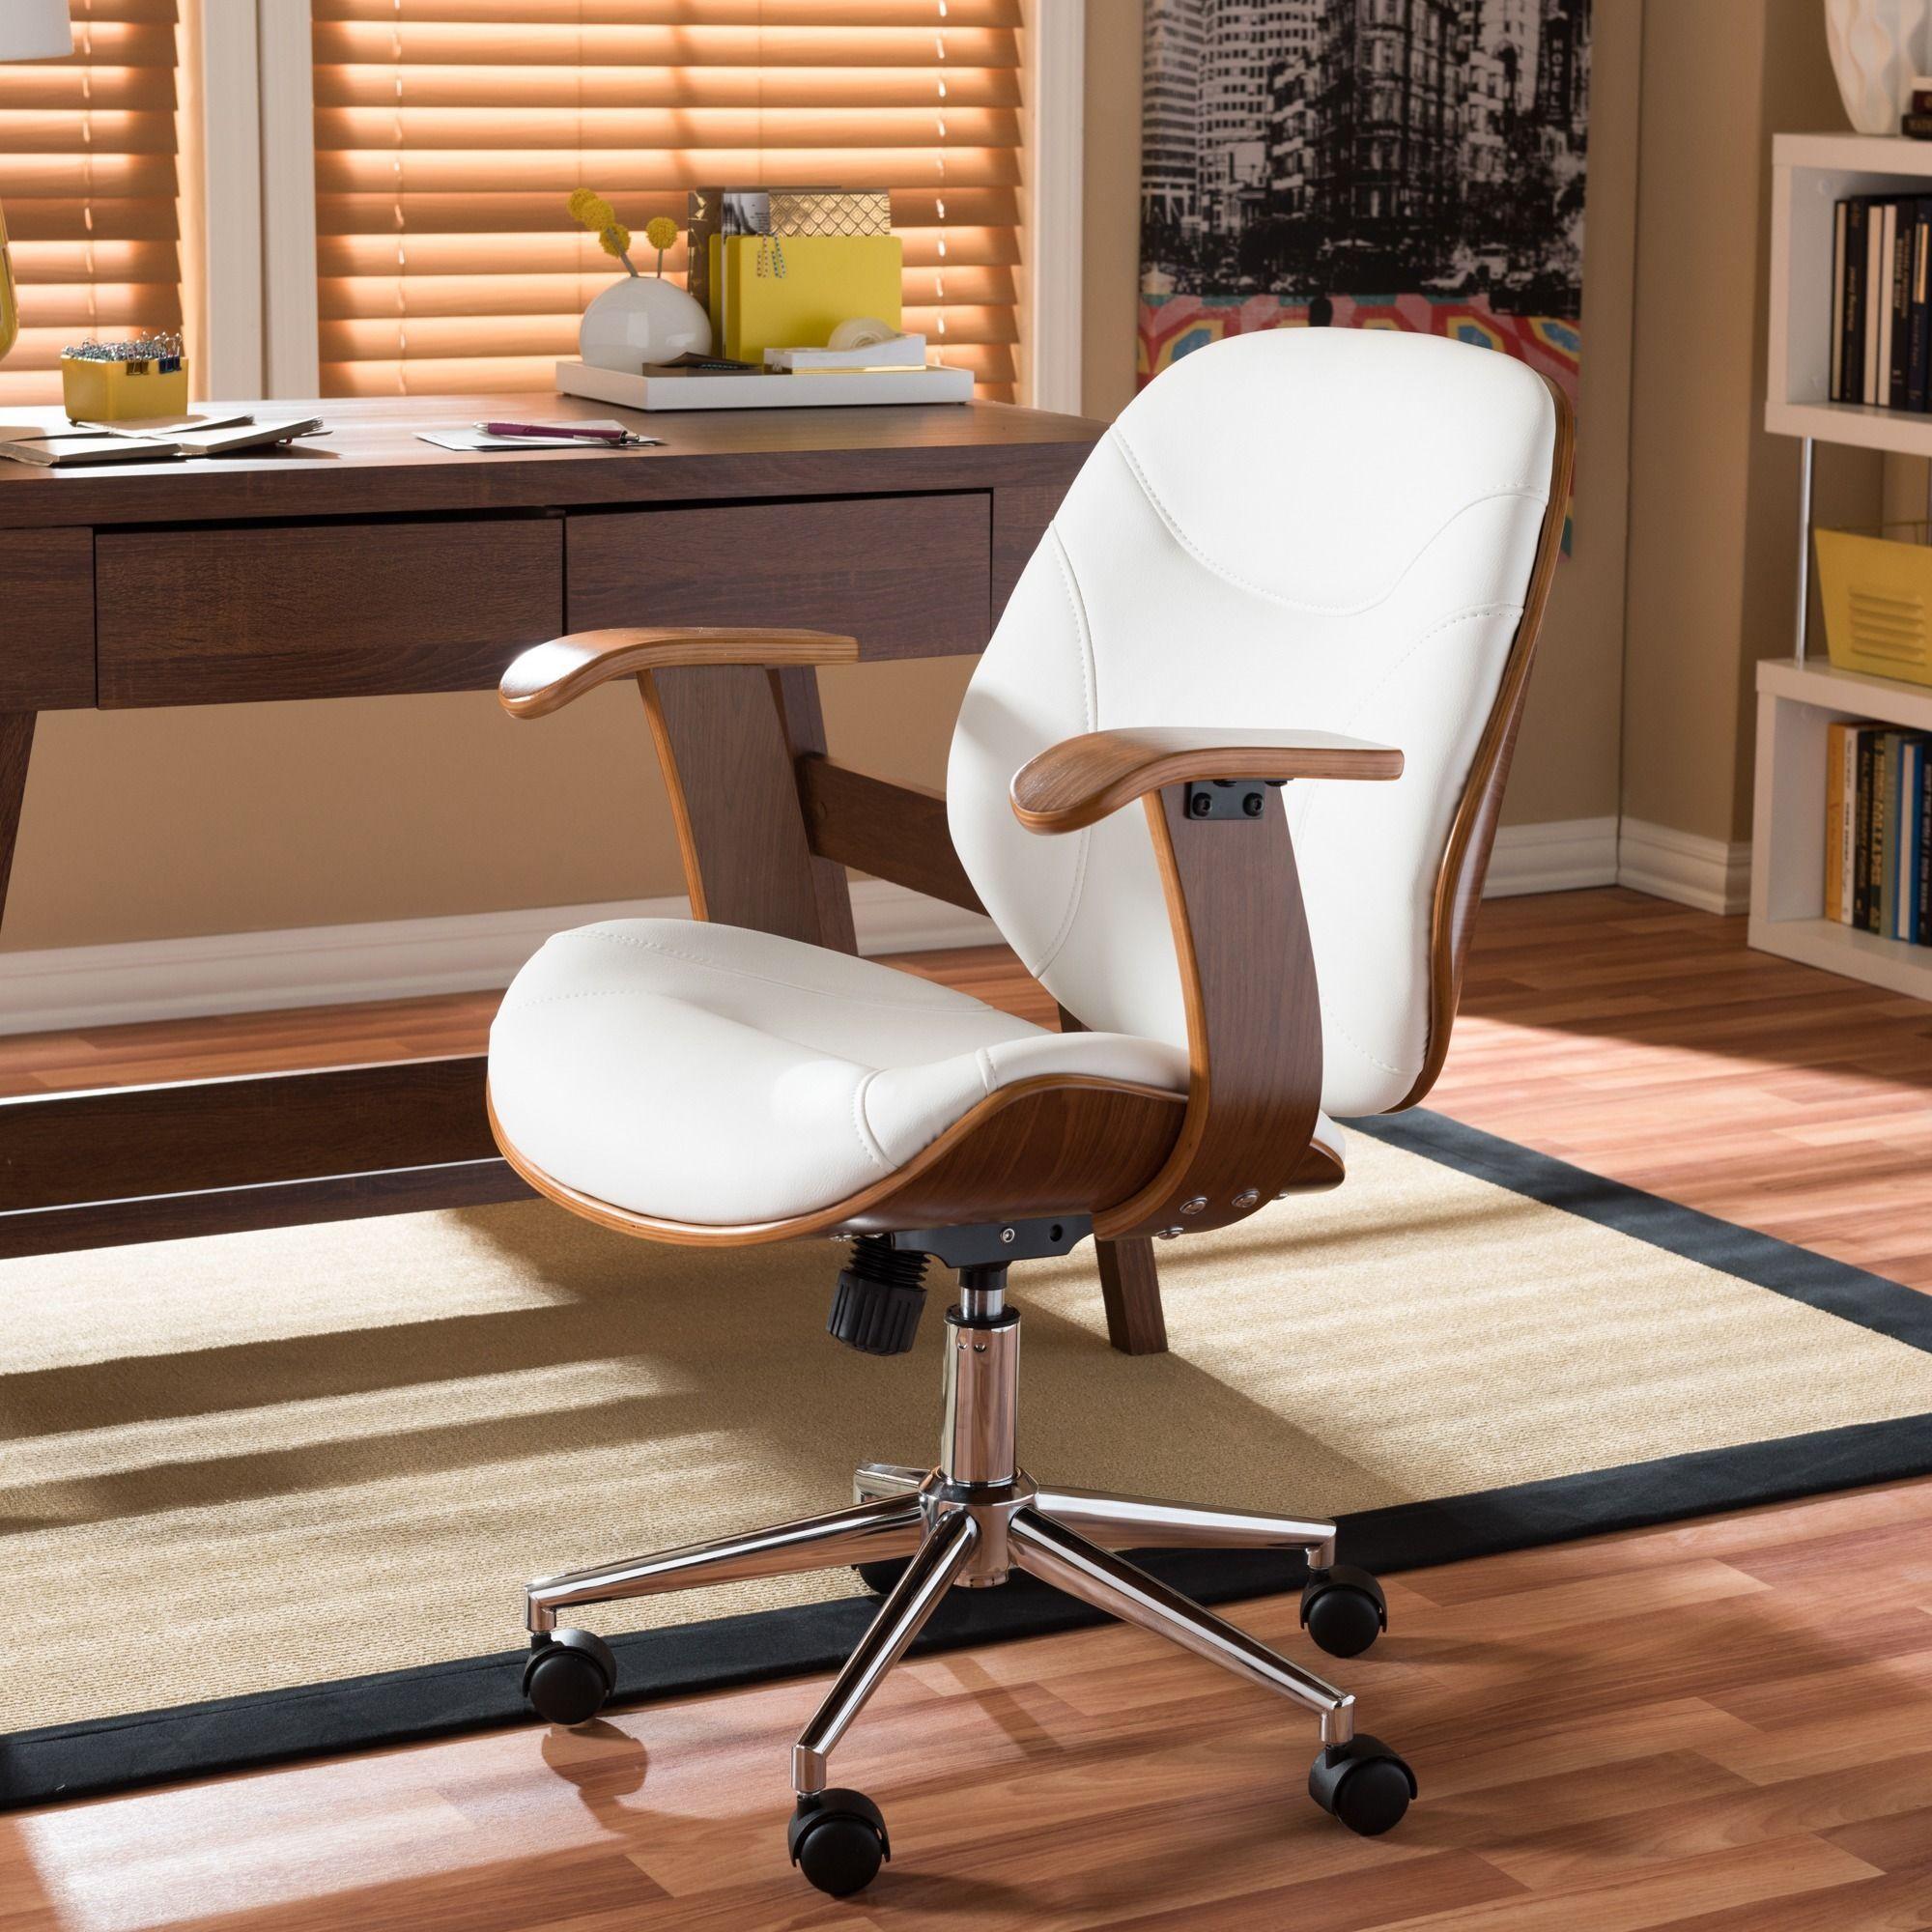 Baxton Studio Rathburn Walnut Modern fice Chair officedesign